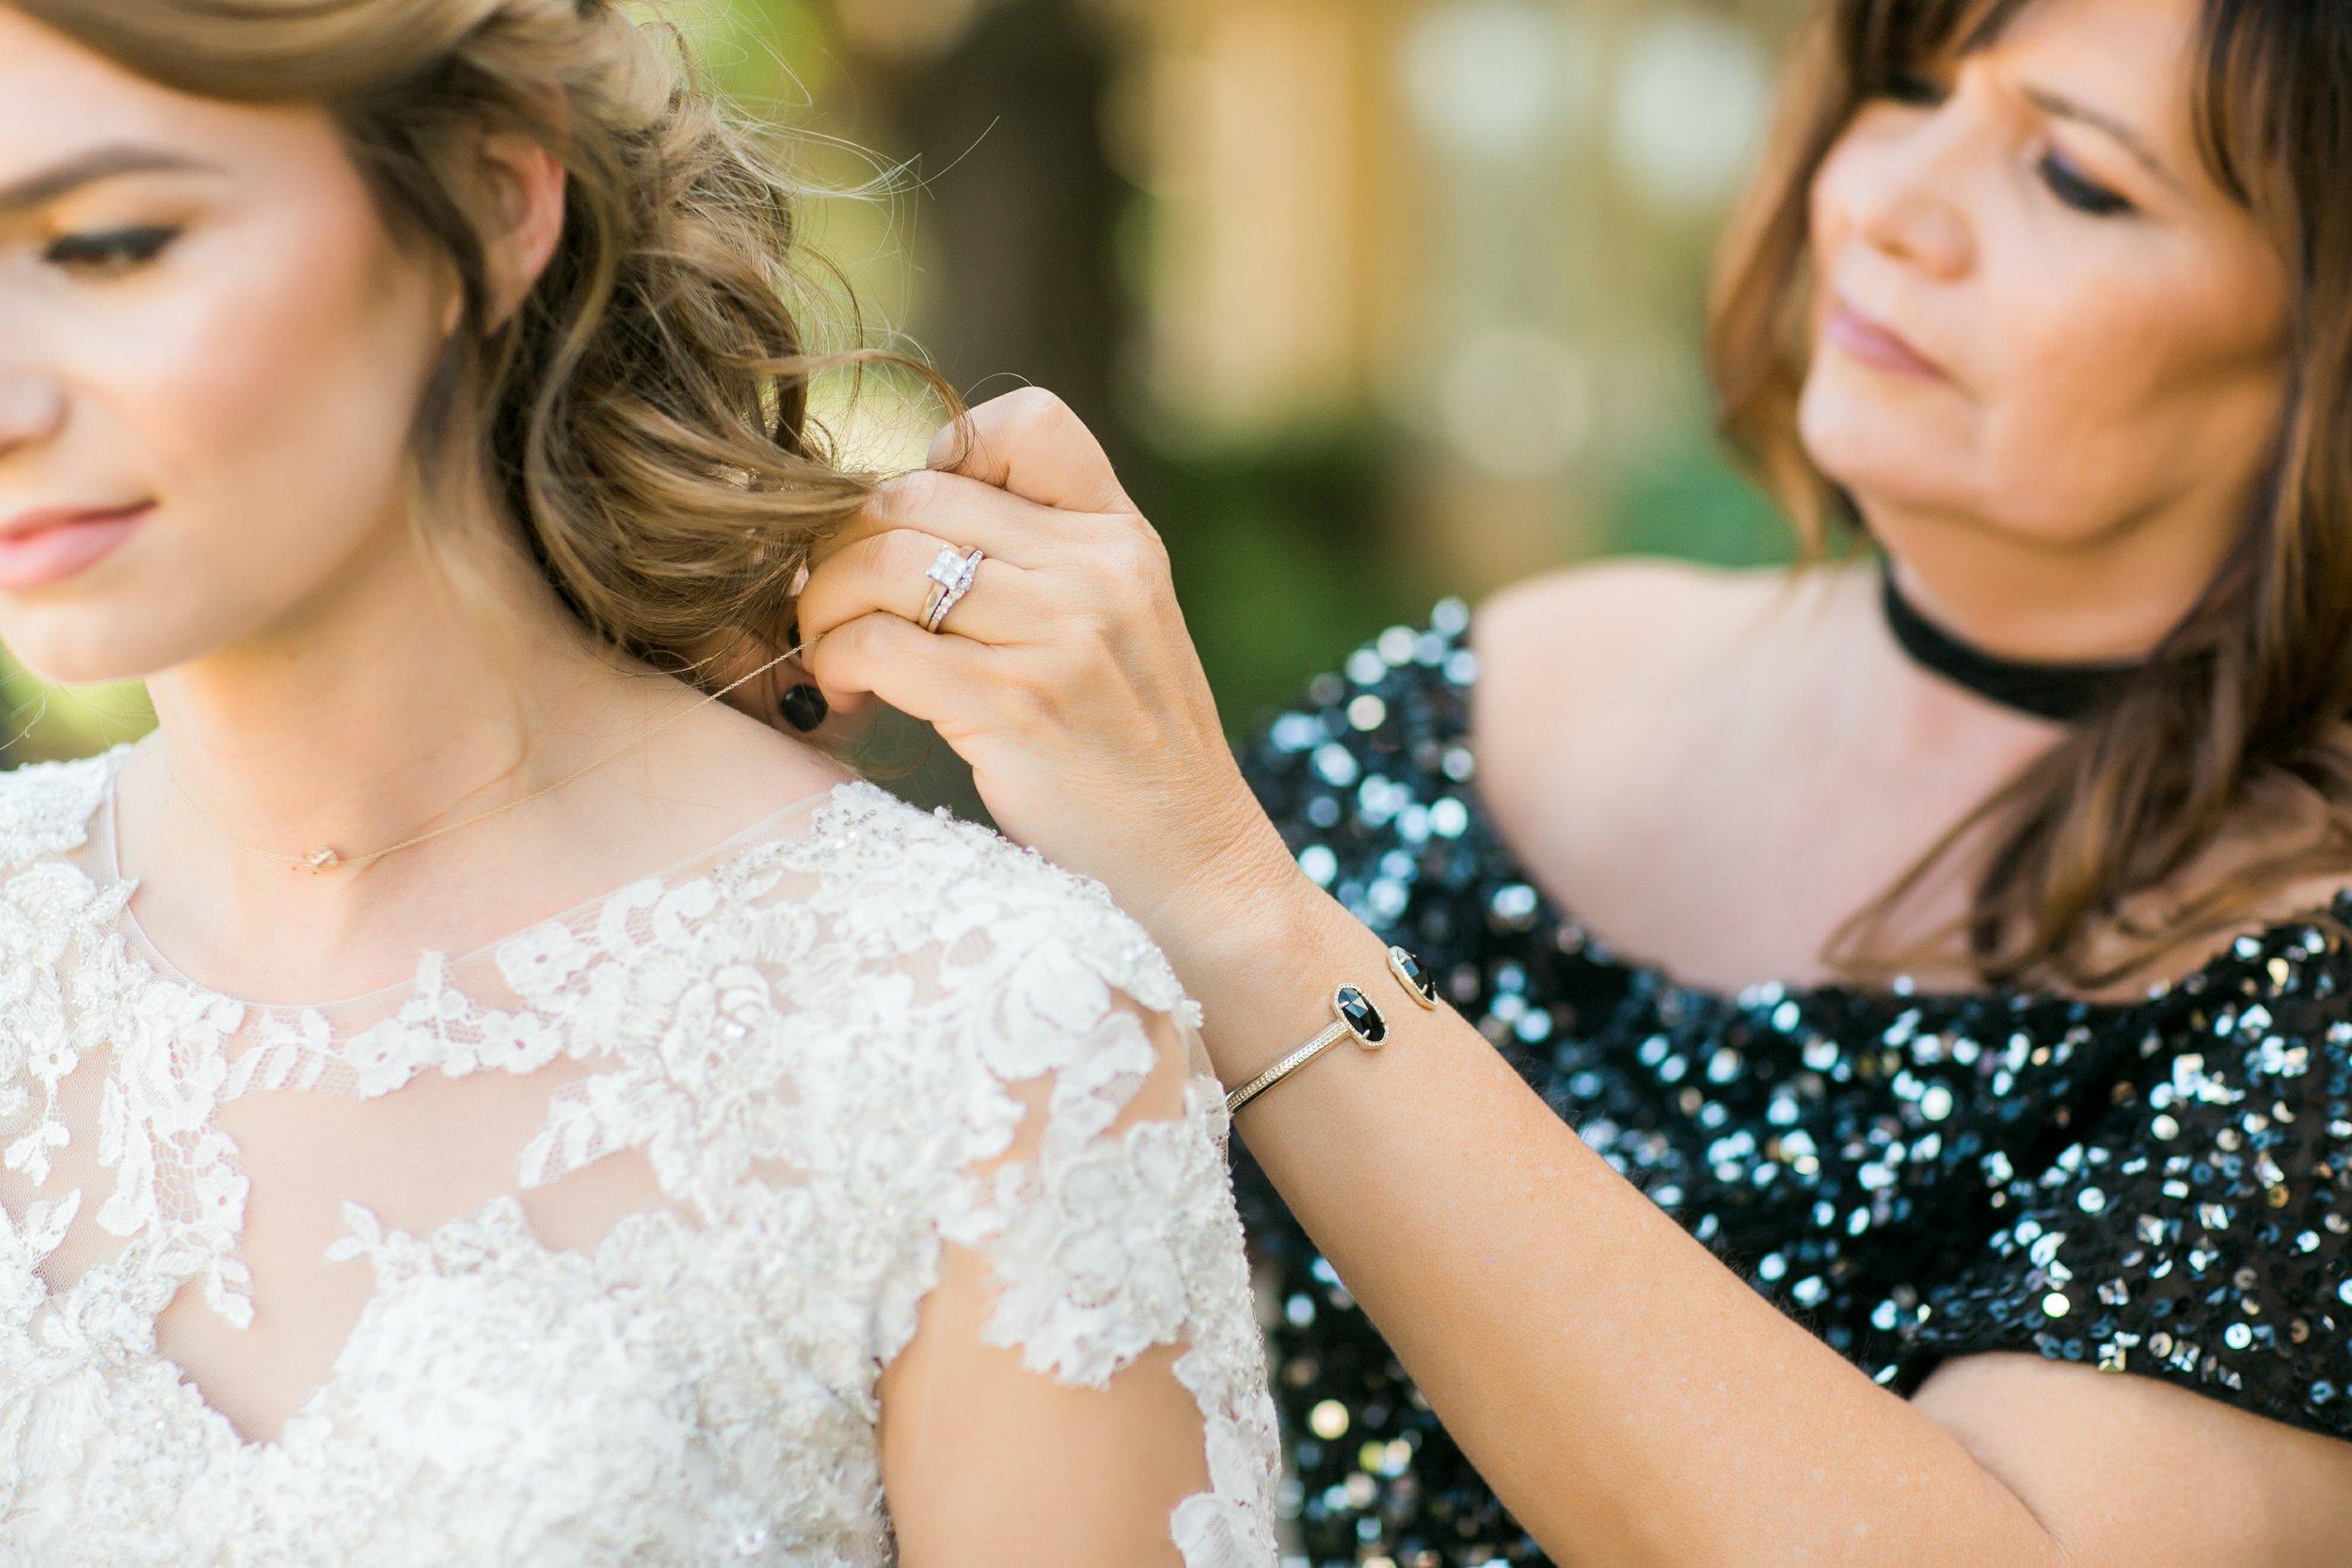 Roberson-Wedding-The-Forum-Lauren-Pinson-Wedding-Photography-Wichita-Falls-Texas-013.jpg